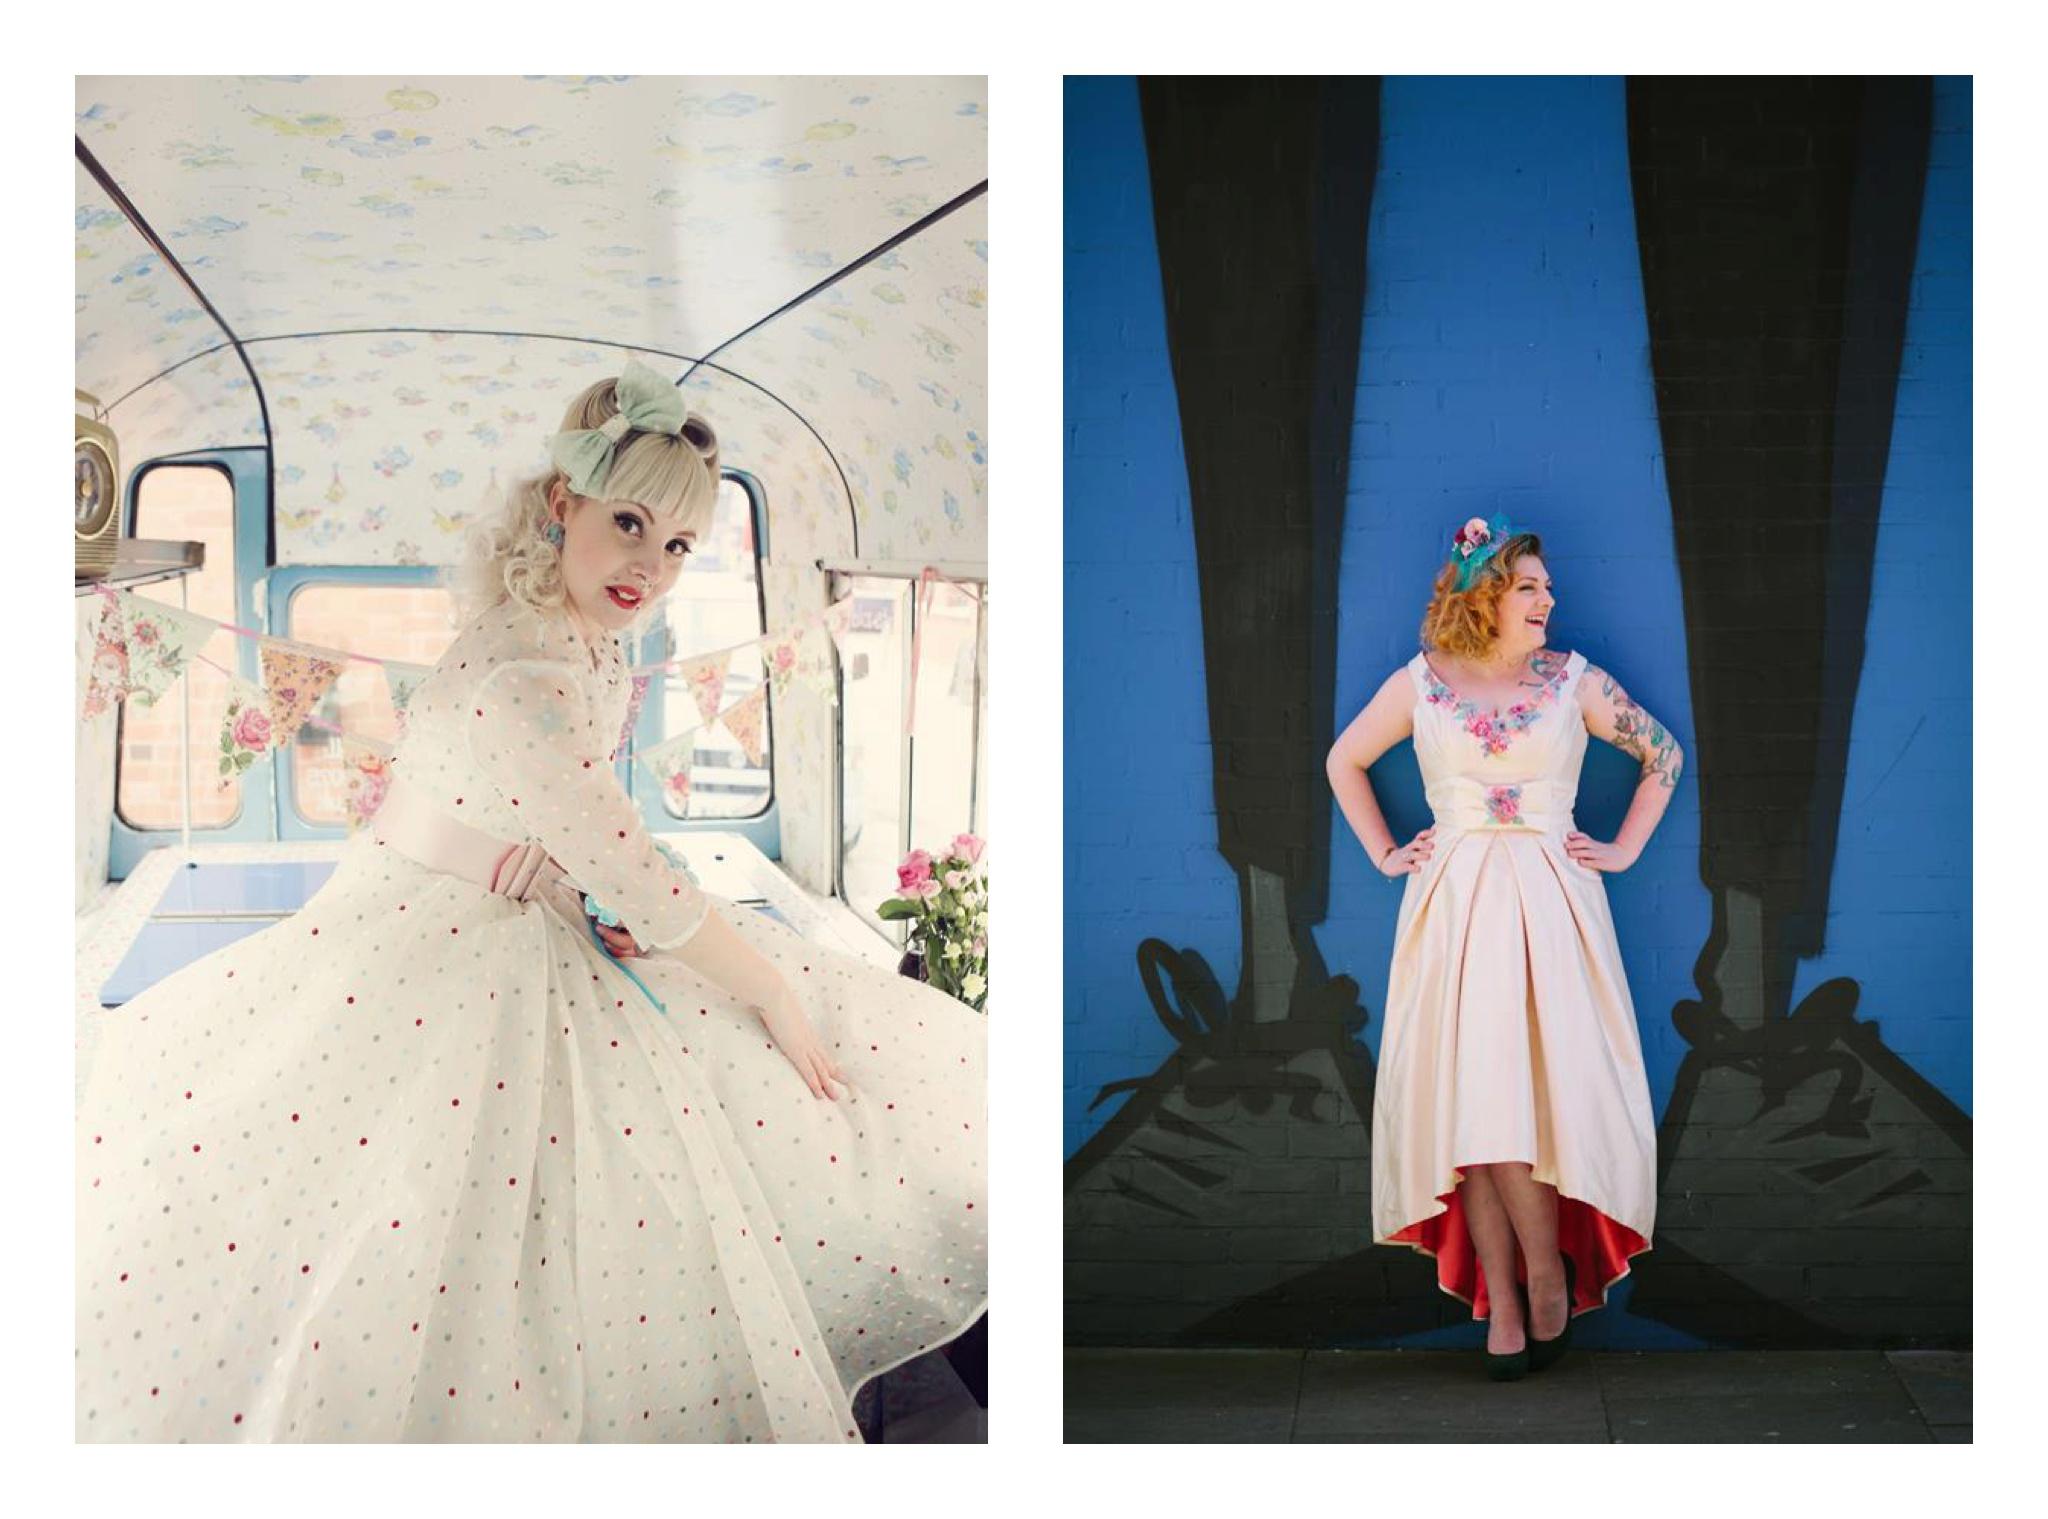 Alternative Wedding Dress S Manchester : Vintage inspired alternative wedding dresses inspiration